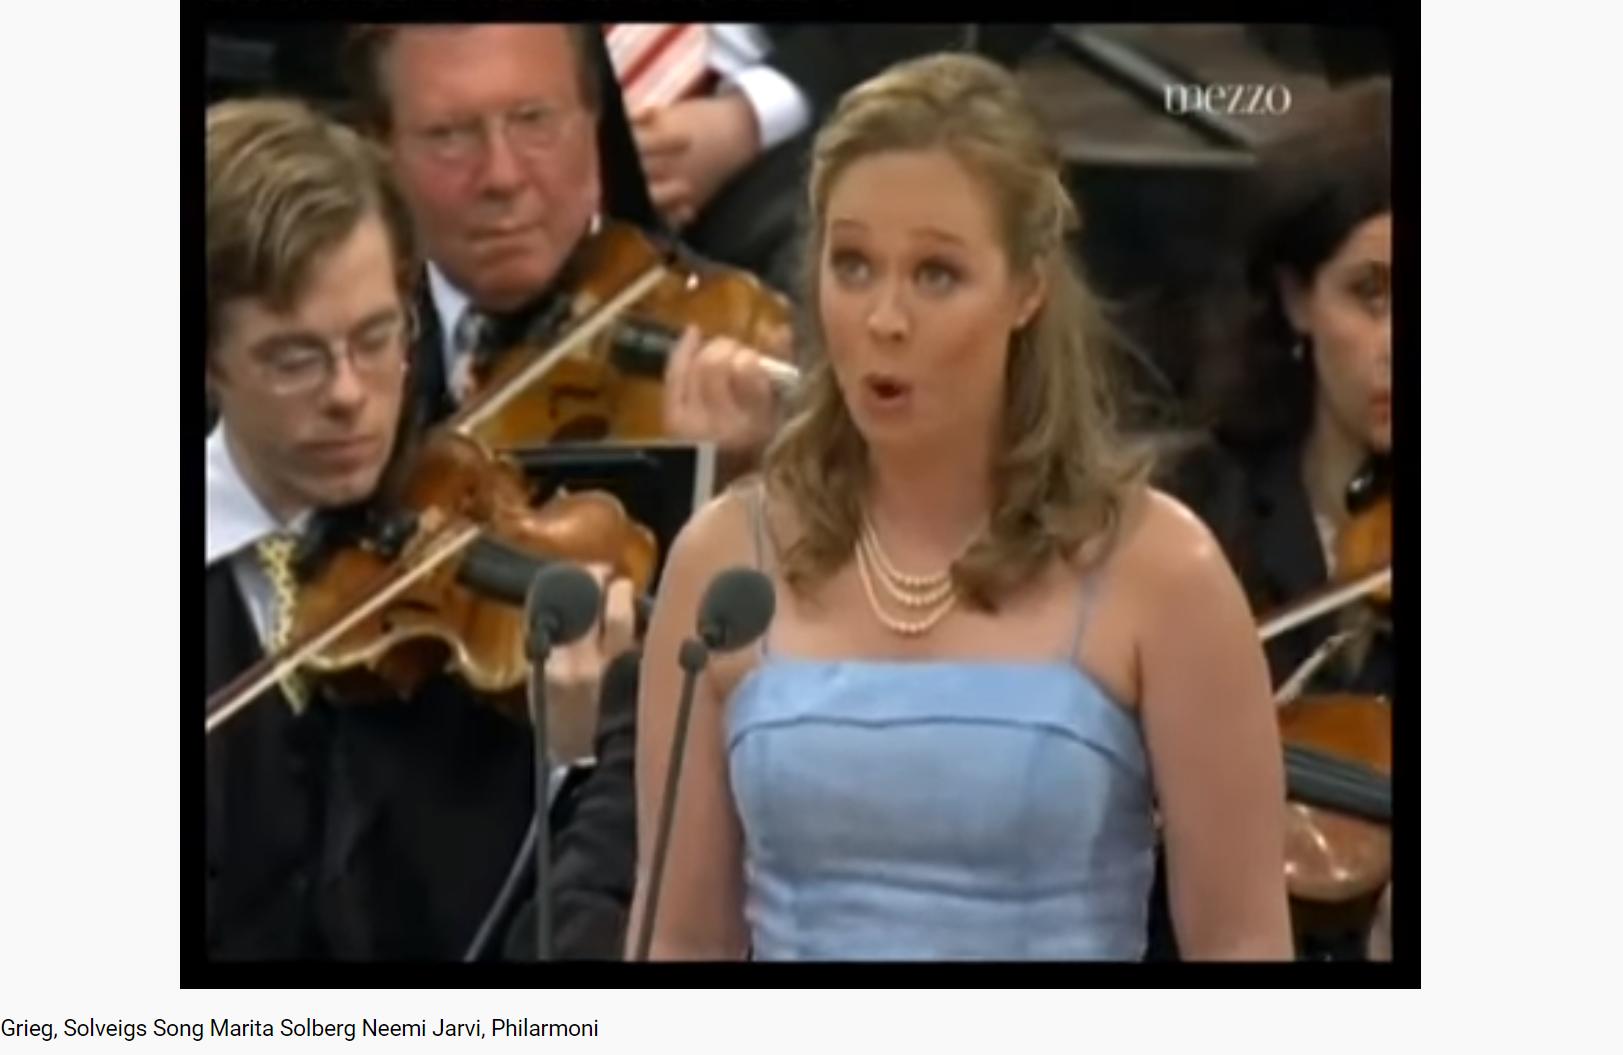 Grieg Peer Gynt chanson de Solveig